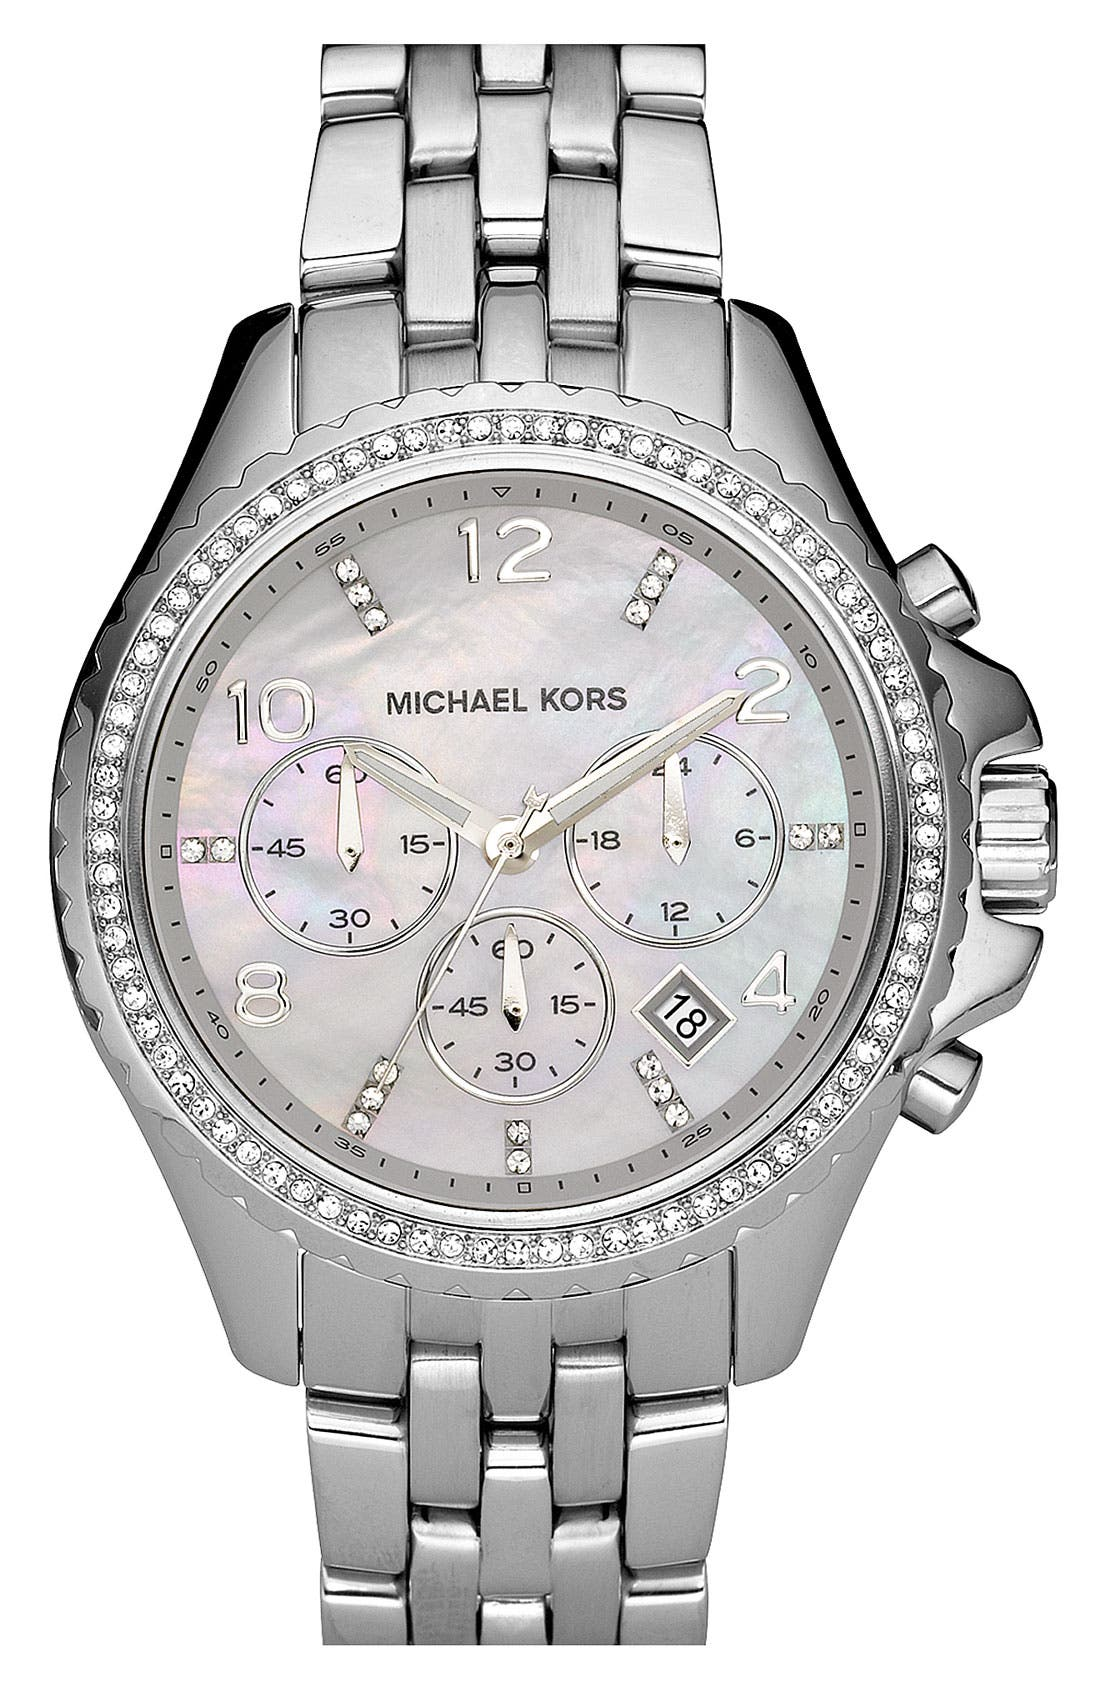 Michael Kors 'Pilot' Watch,                             Main thumbnail 1, color,                             040